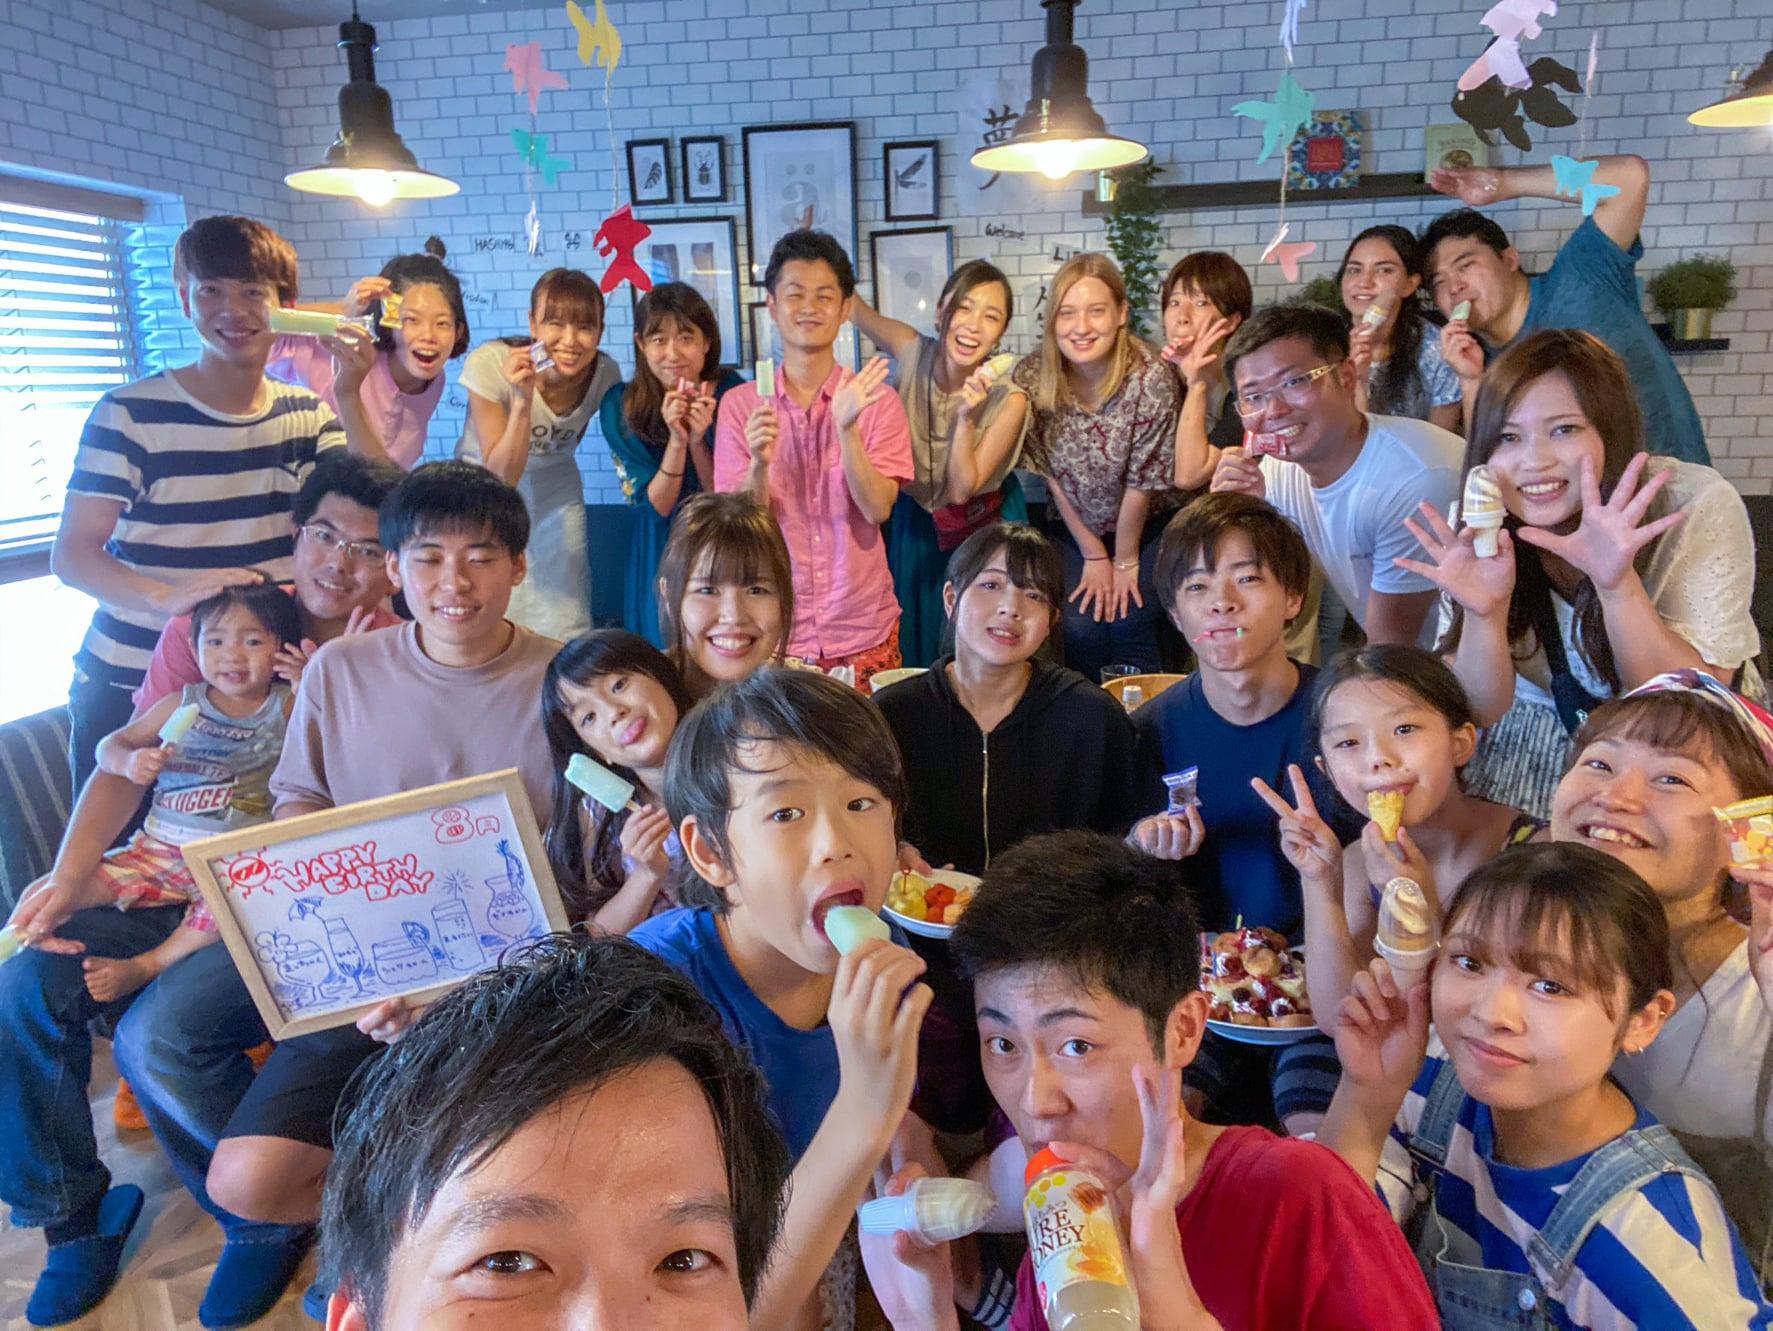 (JP) 毎月のお誕生日会の楽しみ方〜多世代シェアハウスHASH196編〜